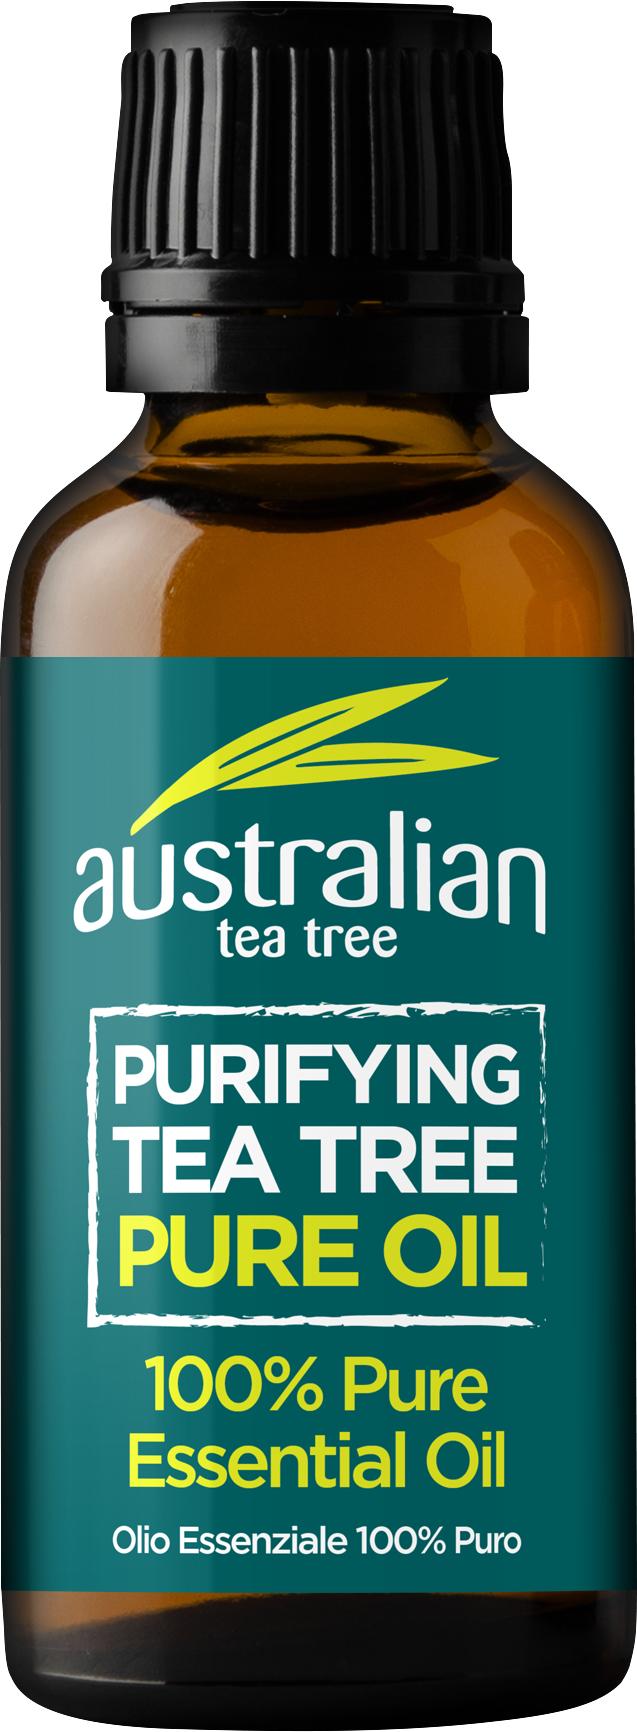 Purifying Tea Tree Pure Oil 25ml